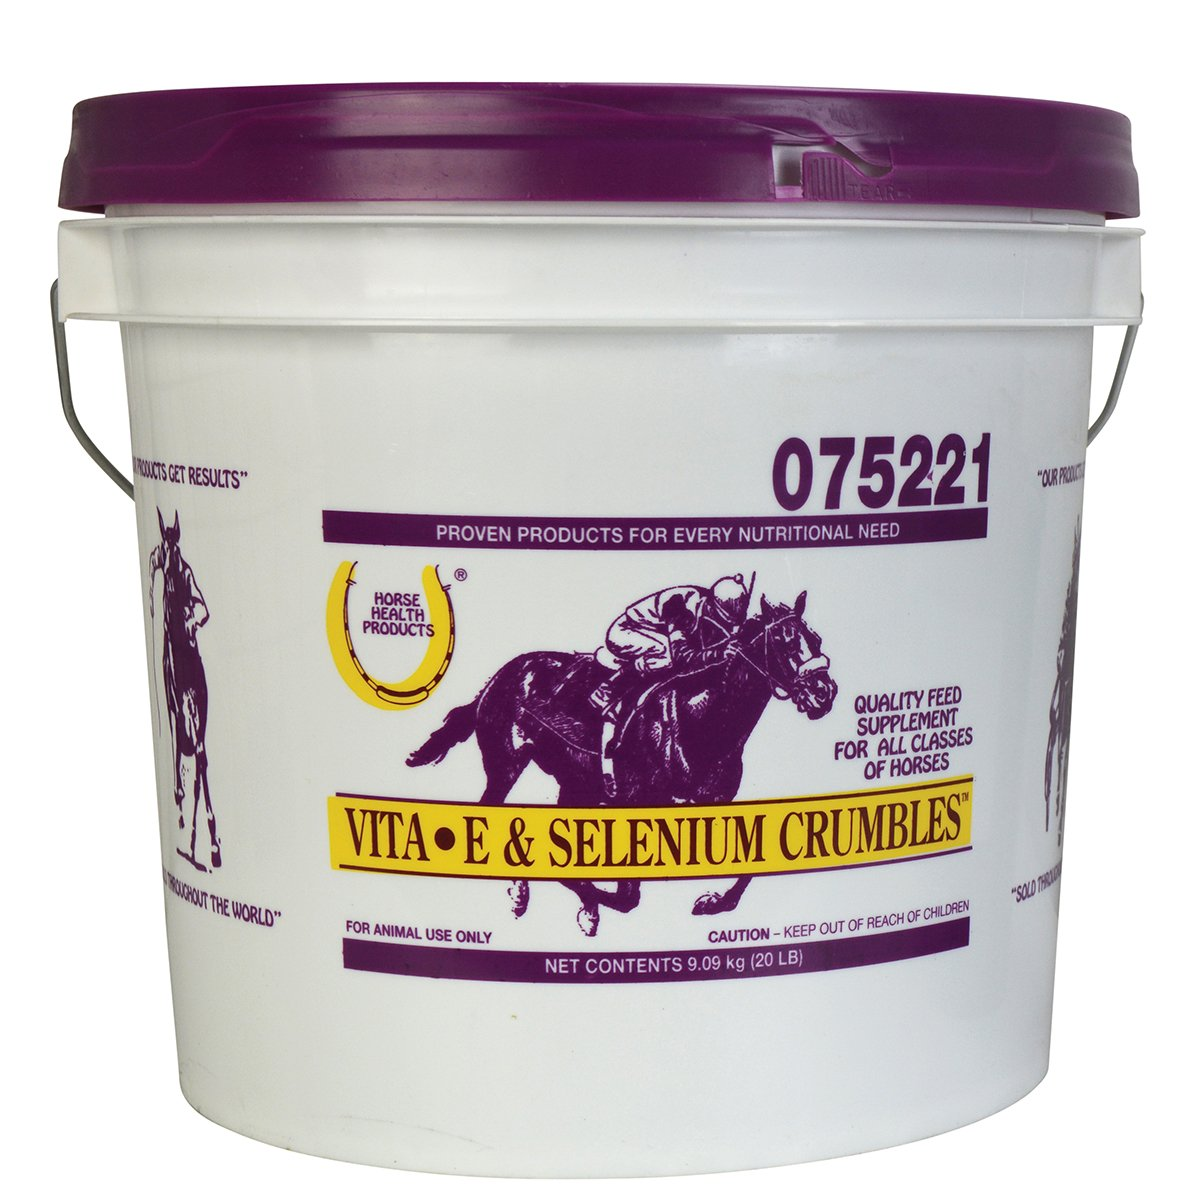 Horse Health Vita-E & Selenium Crumbles Vitamin/Mineral Supplement, 20 lbs